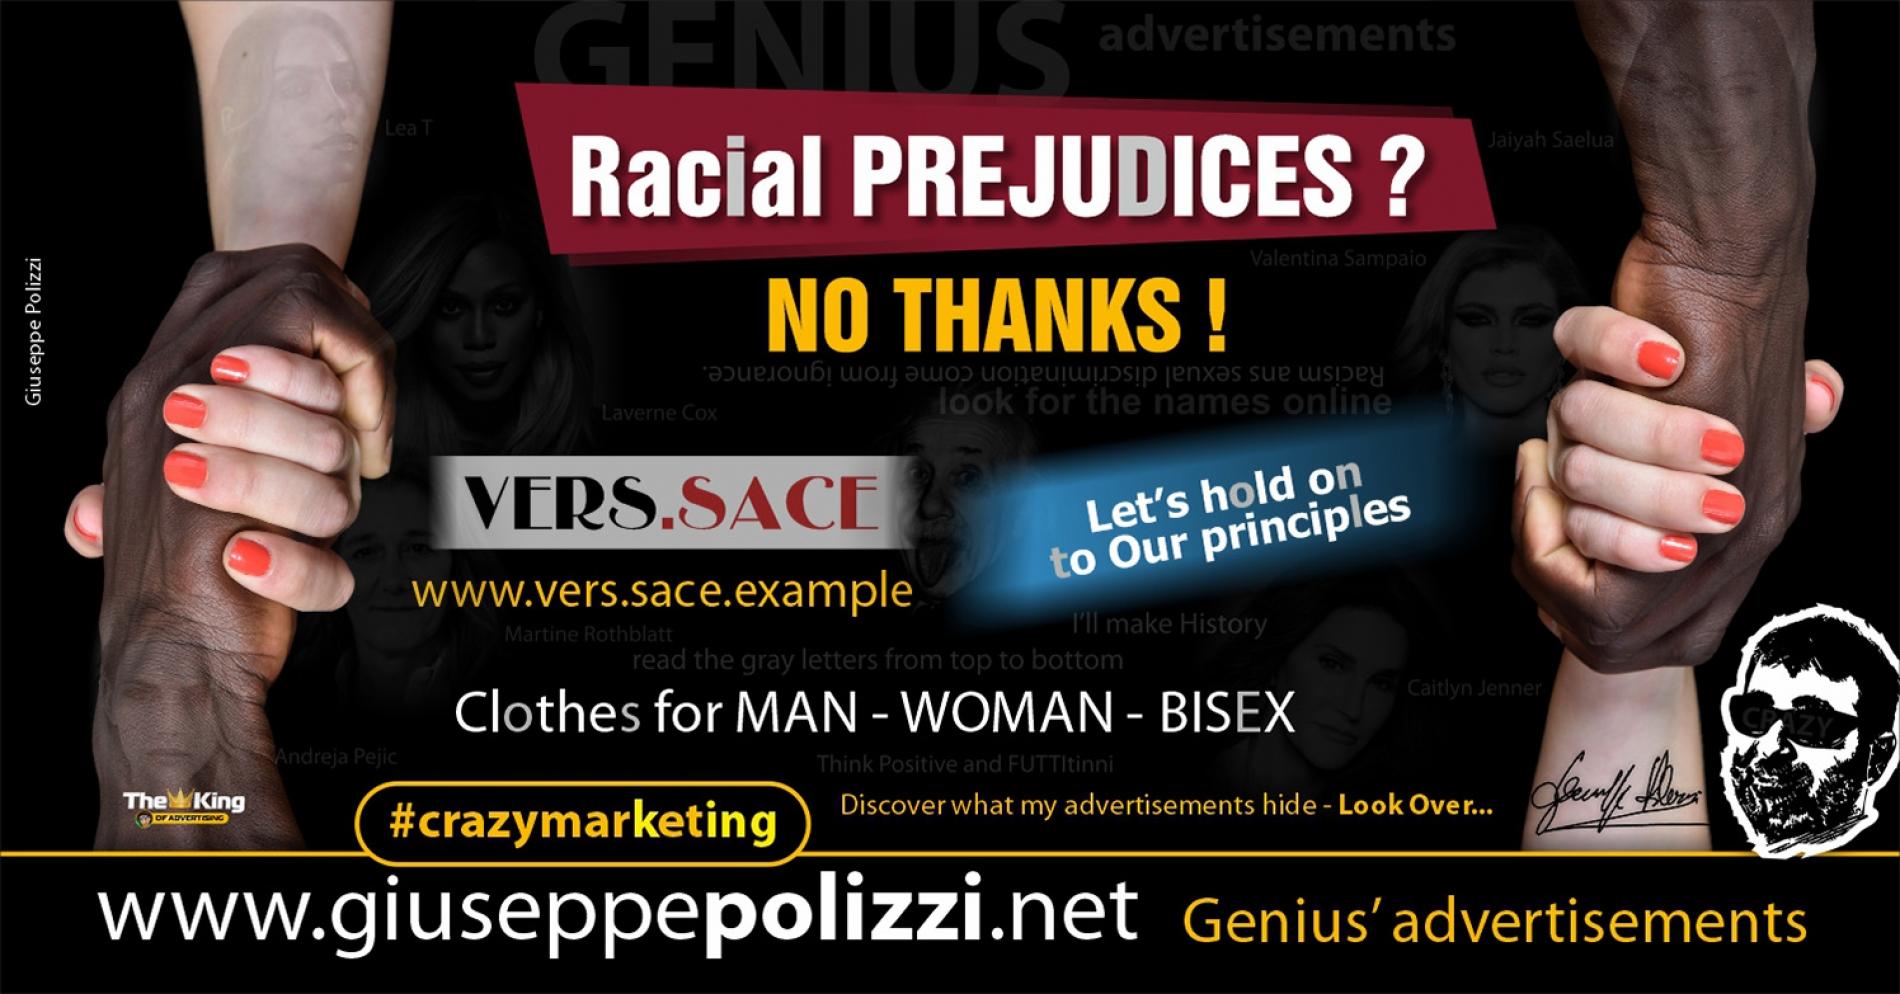 Giuseppe Polizzi Crazymarketing Racial Prejudices advertisements